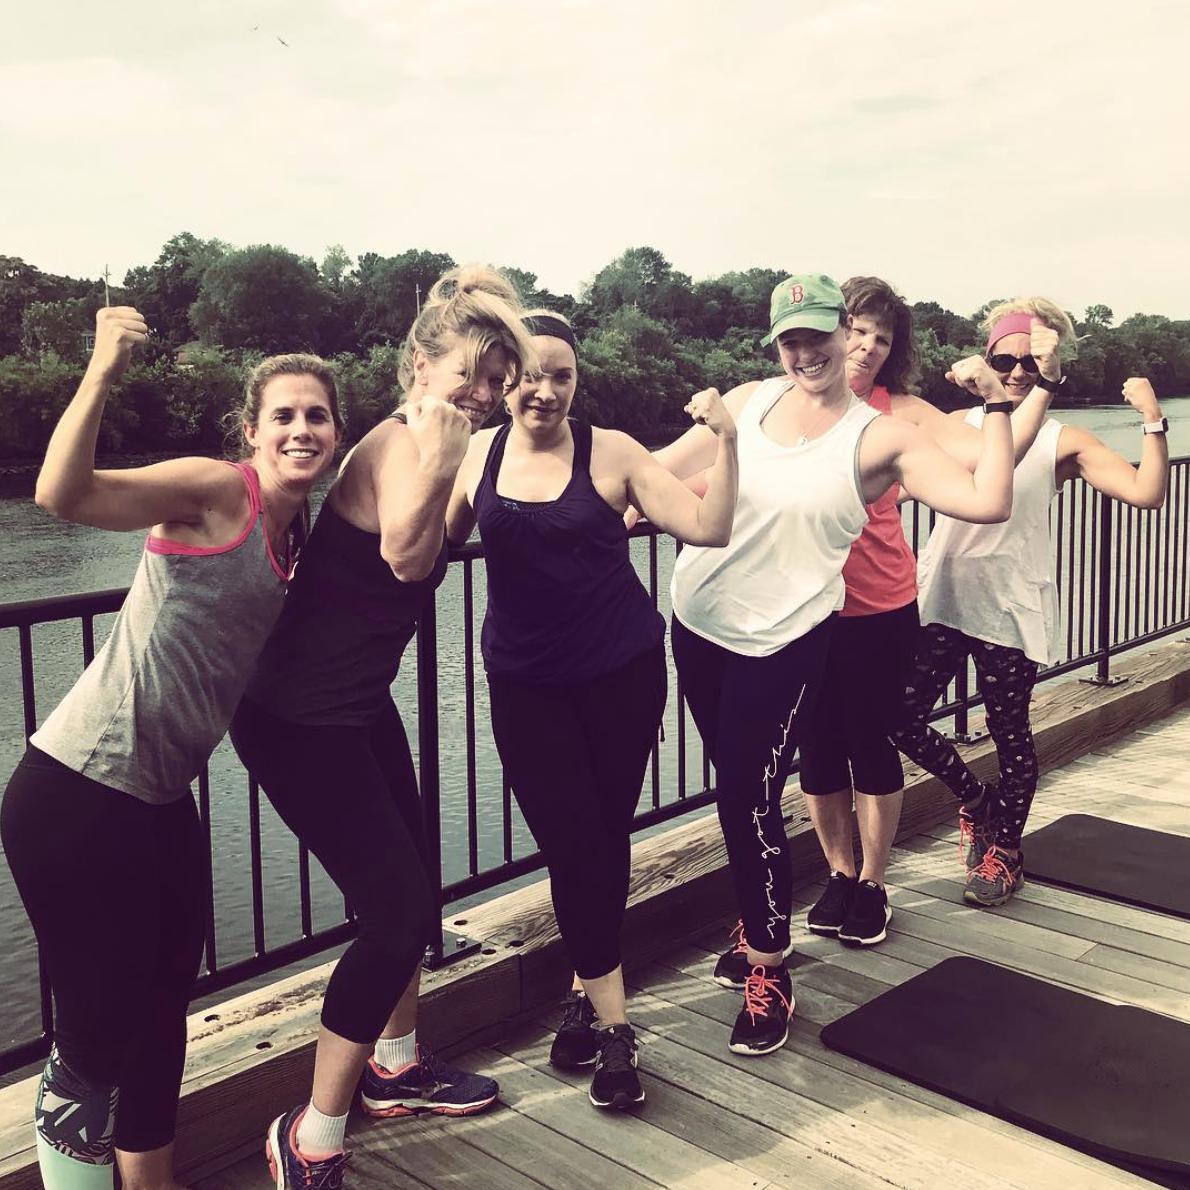 the-crew-revenge-tour-boardwalk-workout